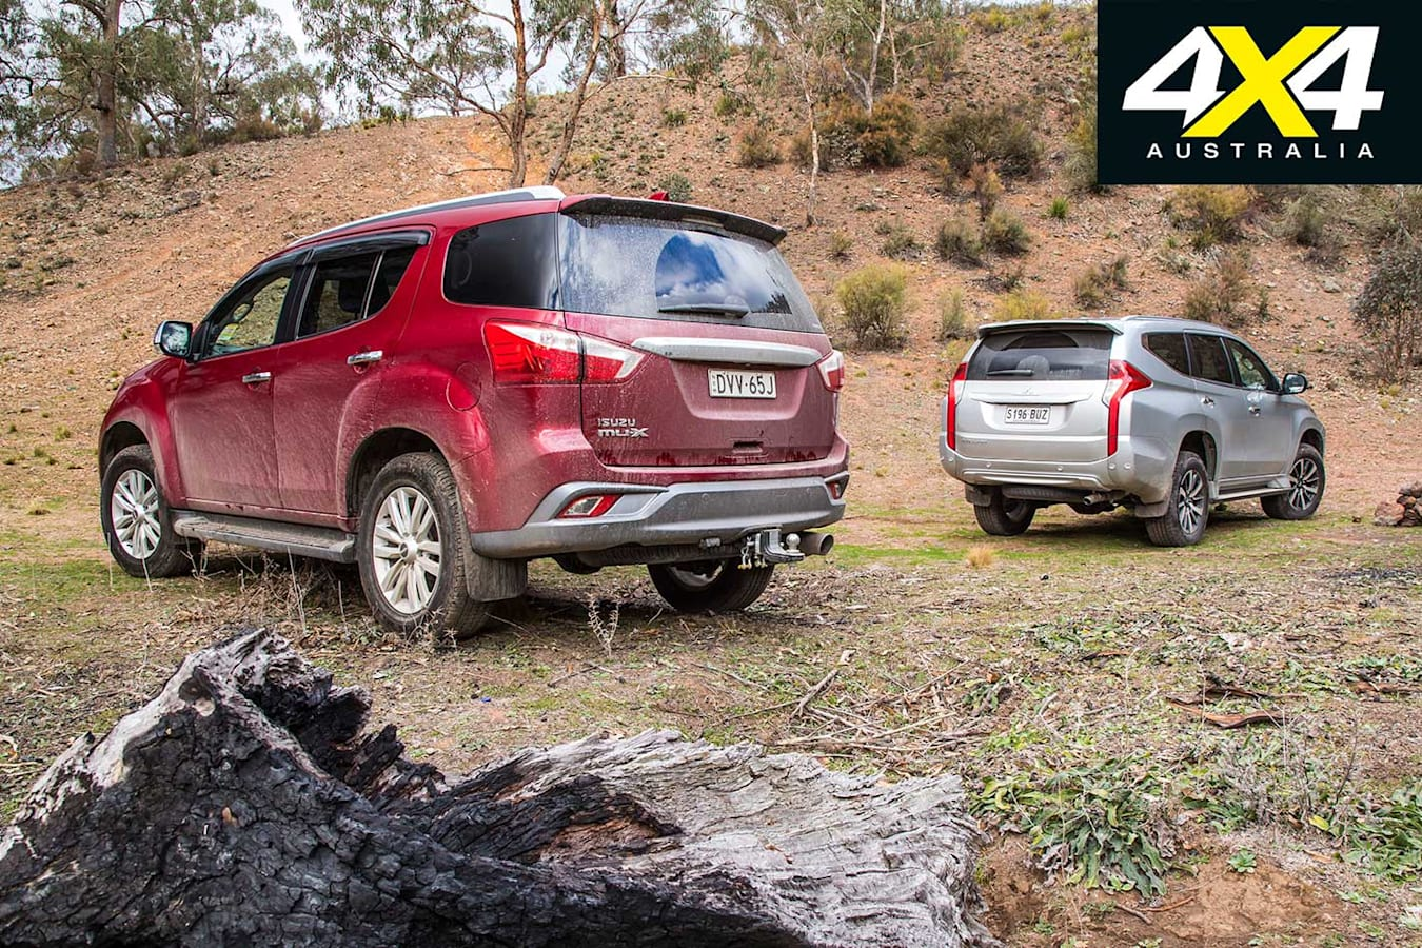 2018 Isuzu MU X Vs Mitsubishi Pajero Sport Comparison Jpg